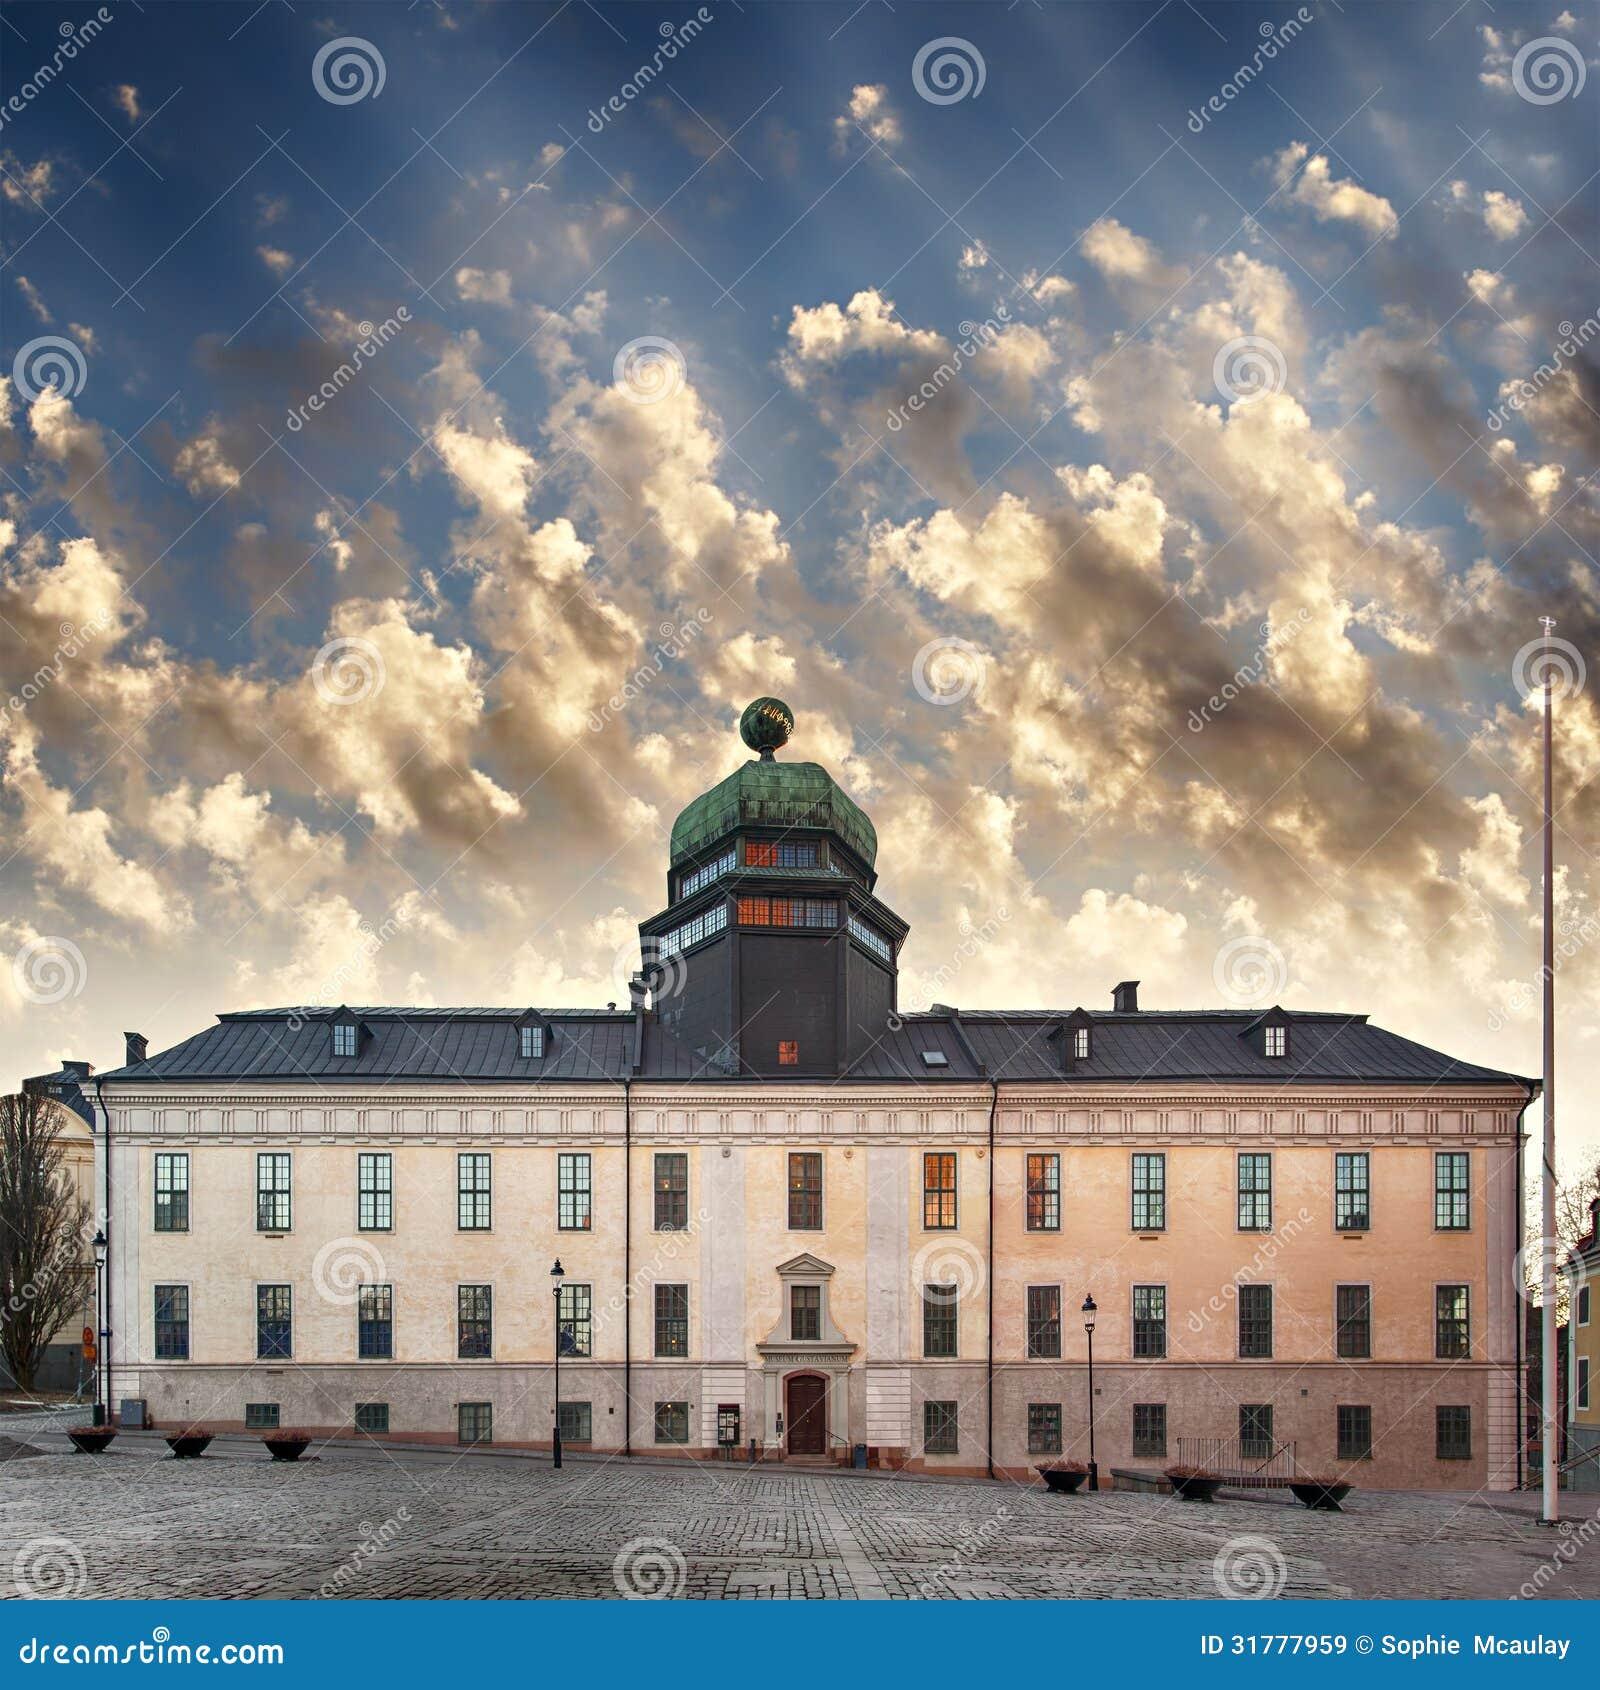 Uppsala university museum stock image. Image of anatomical - 31777959 8ec1bb747b050